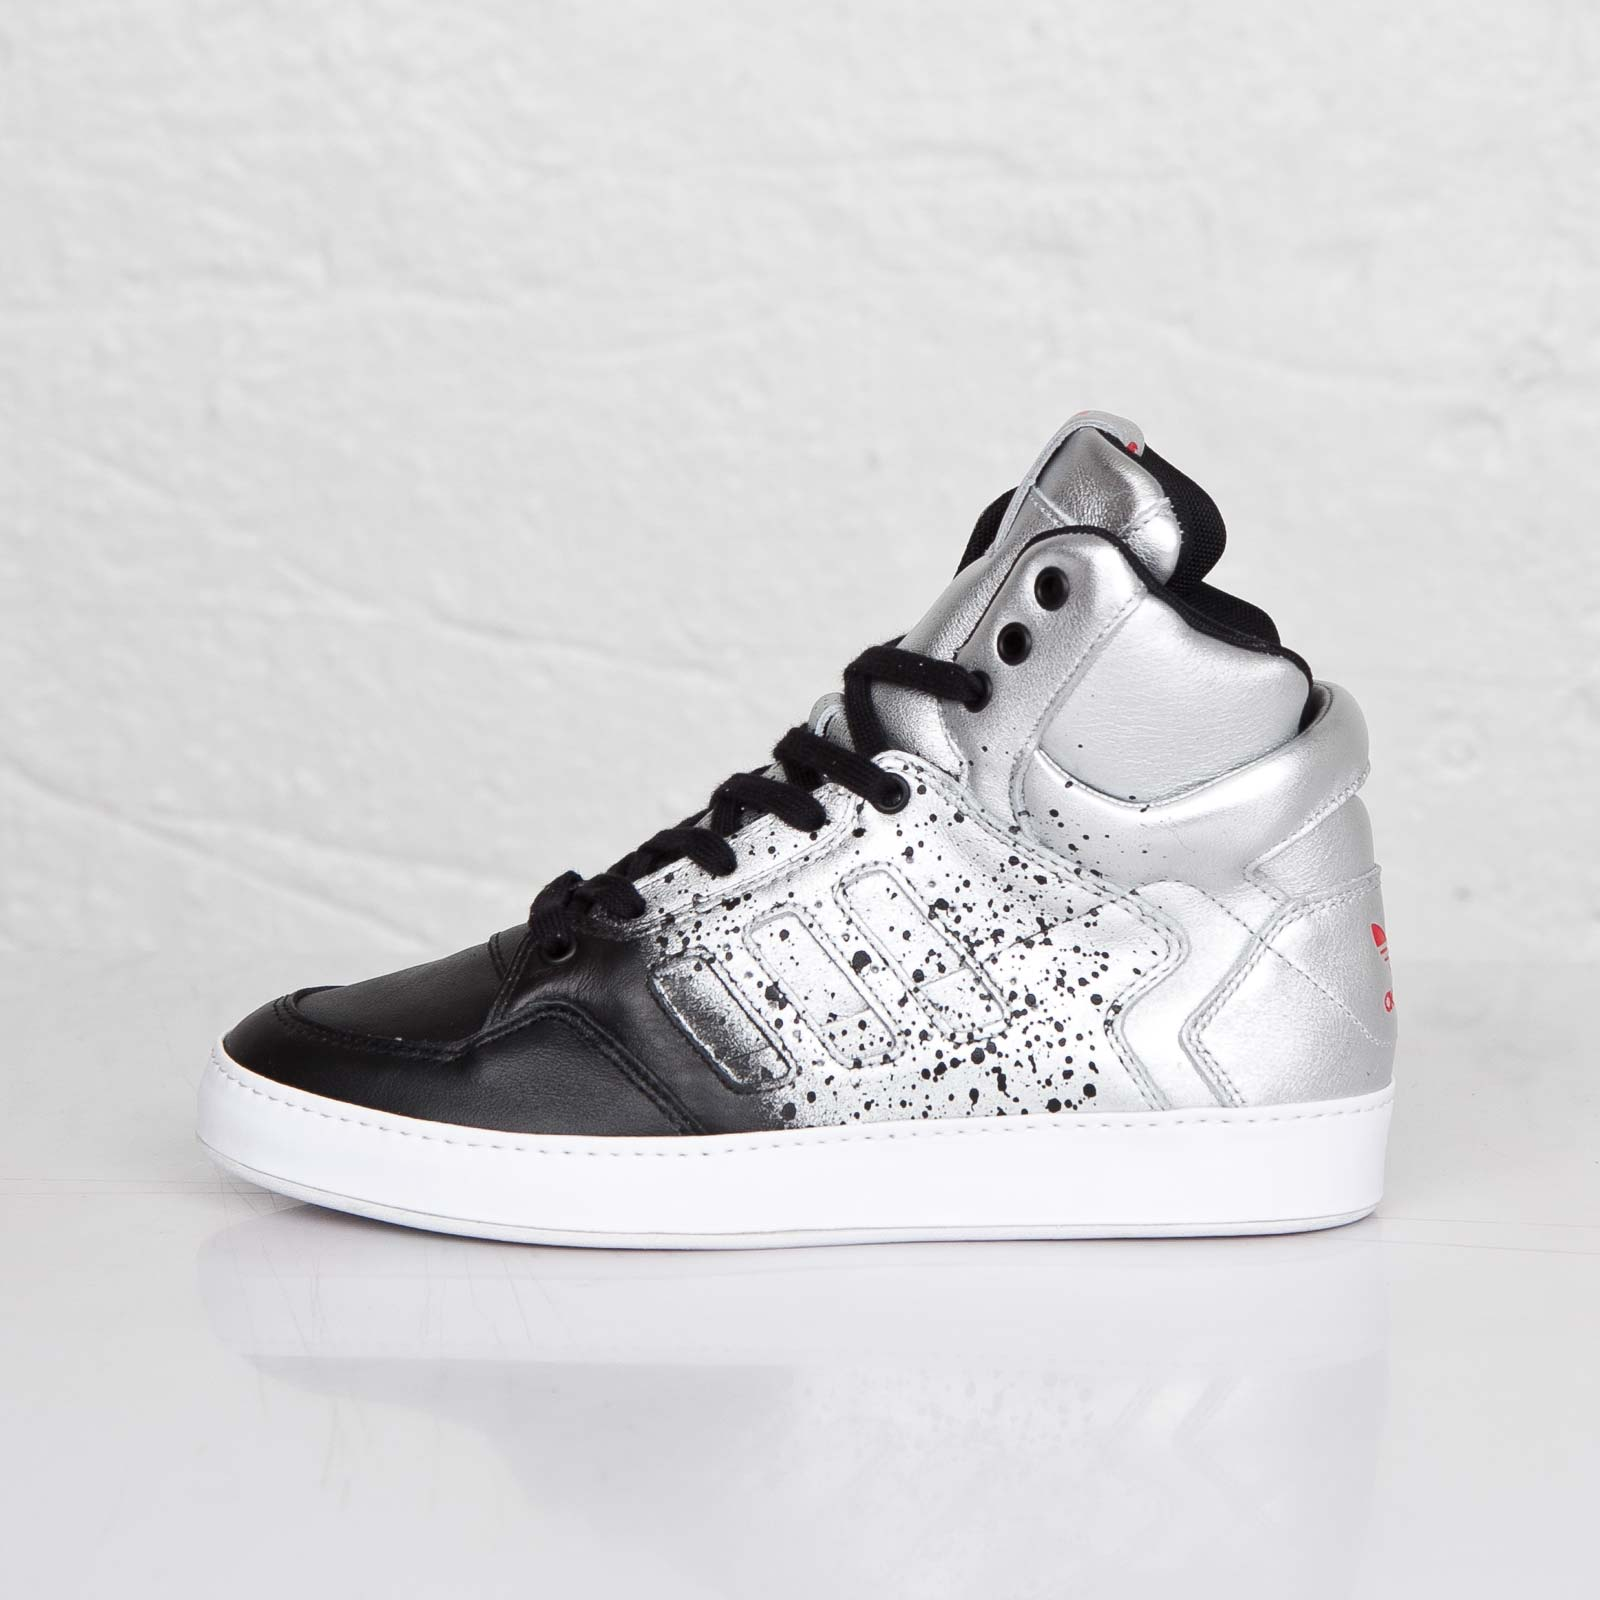 reputable site 5fdd9 de055 ... adidas Bankshot 2.0 W ...